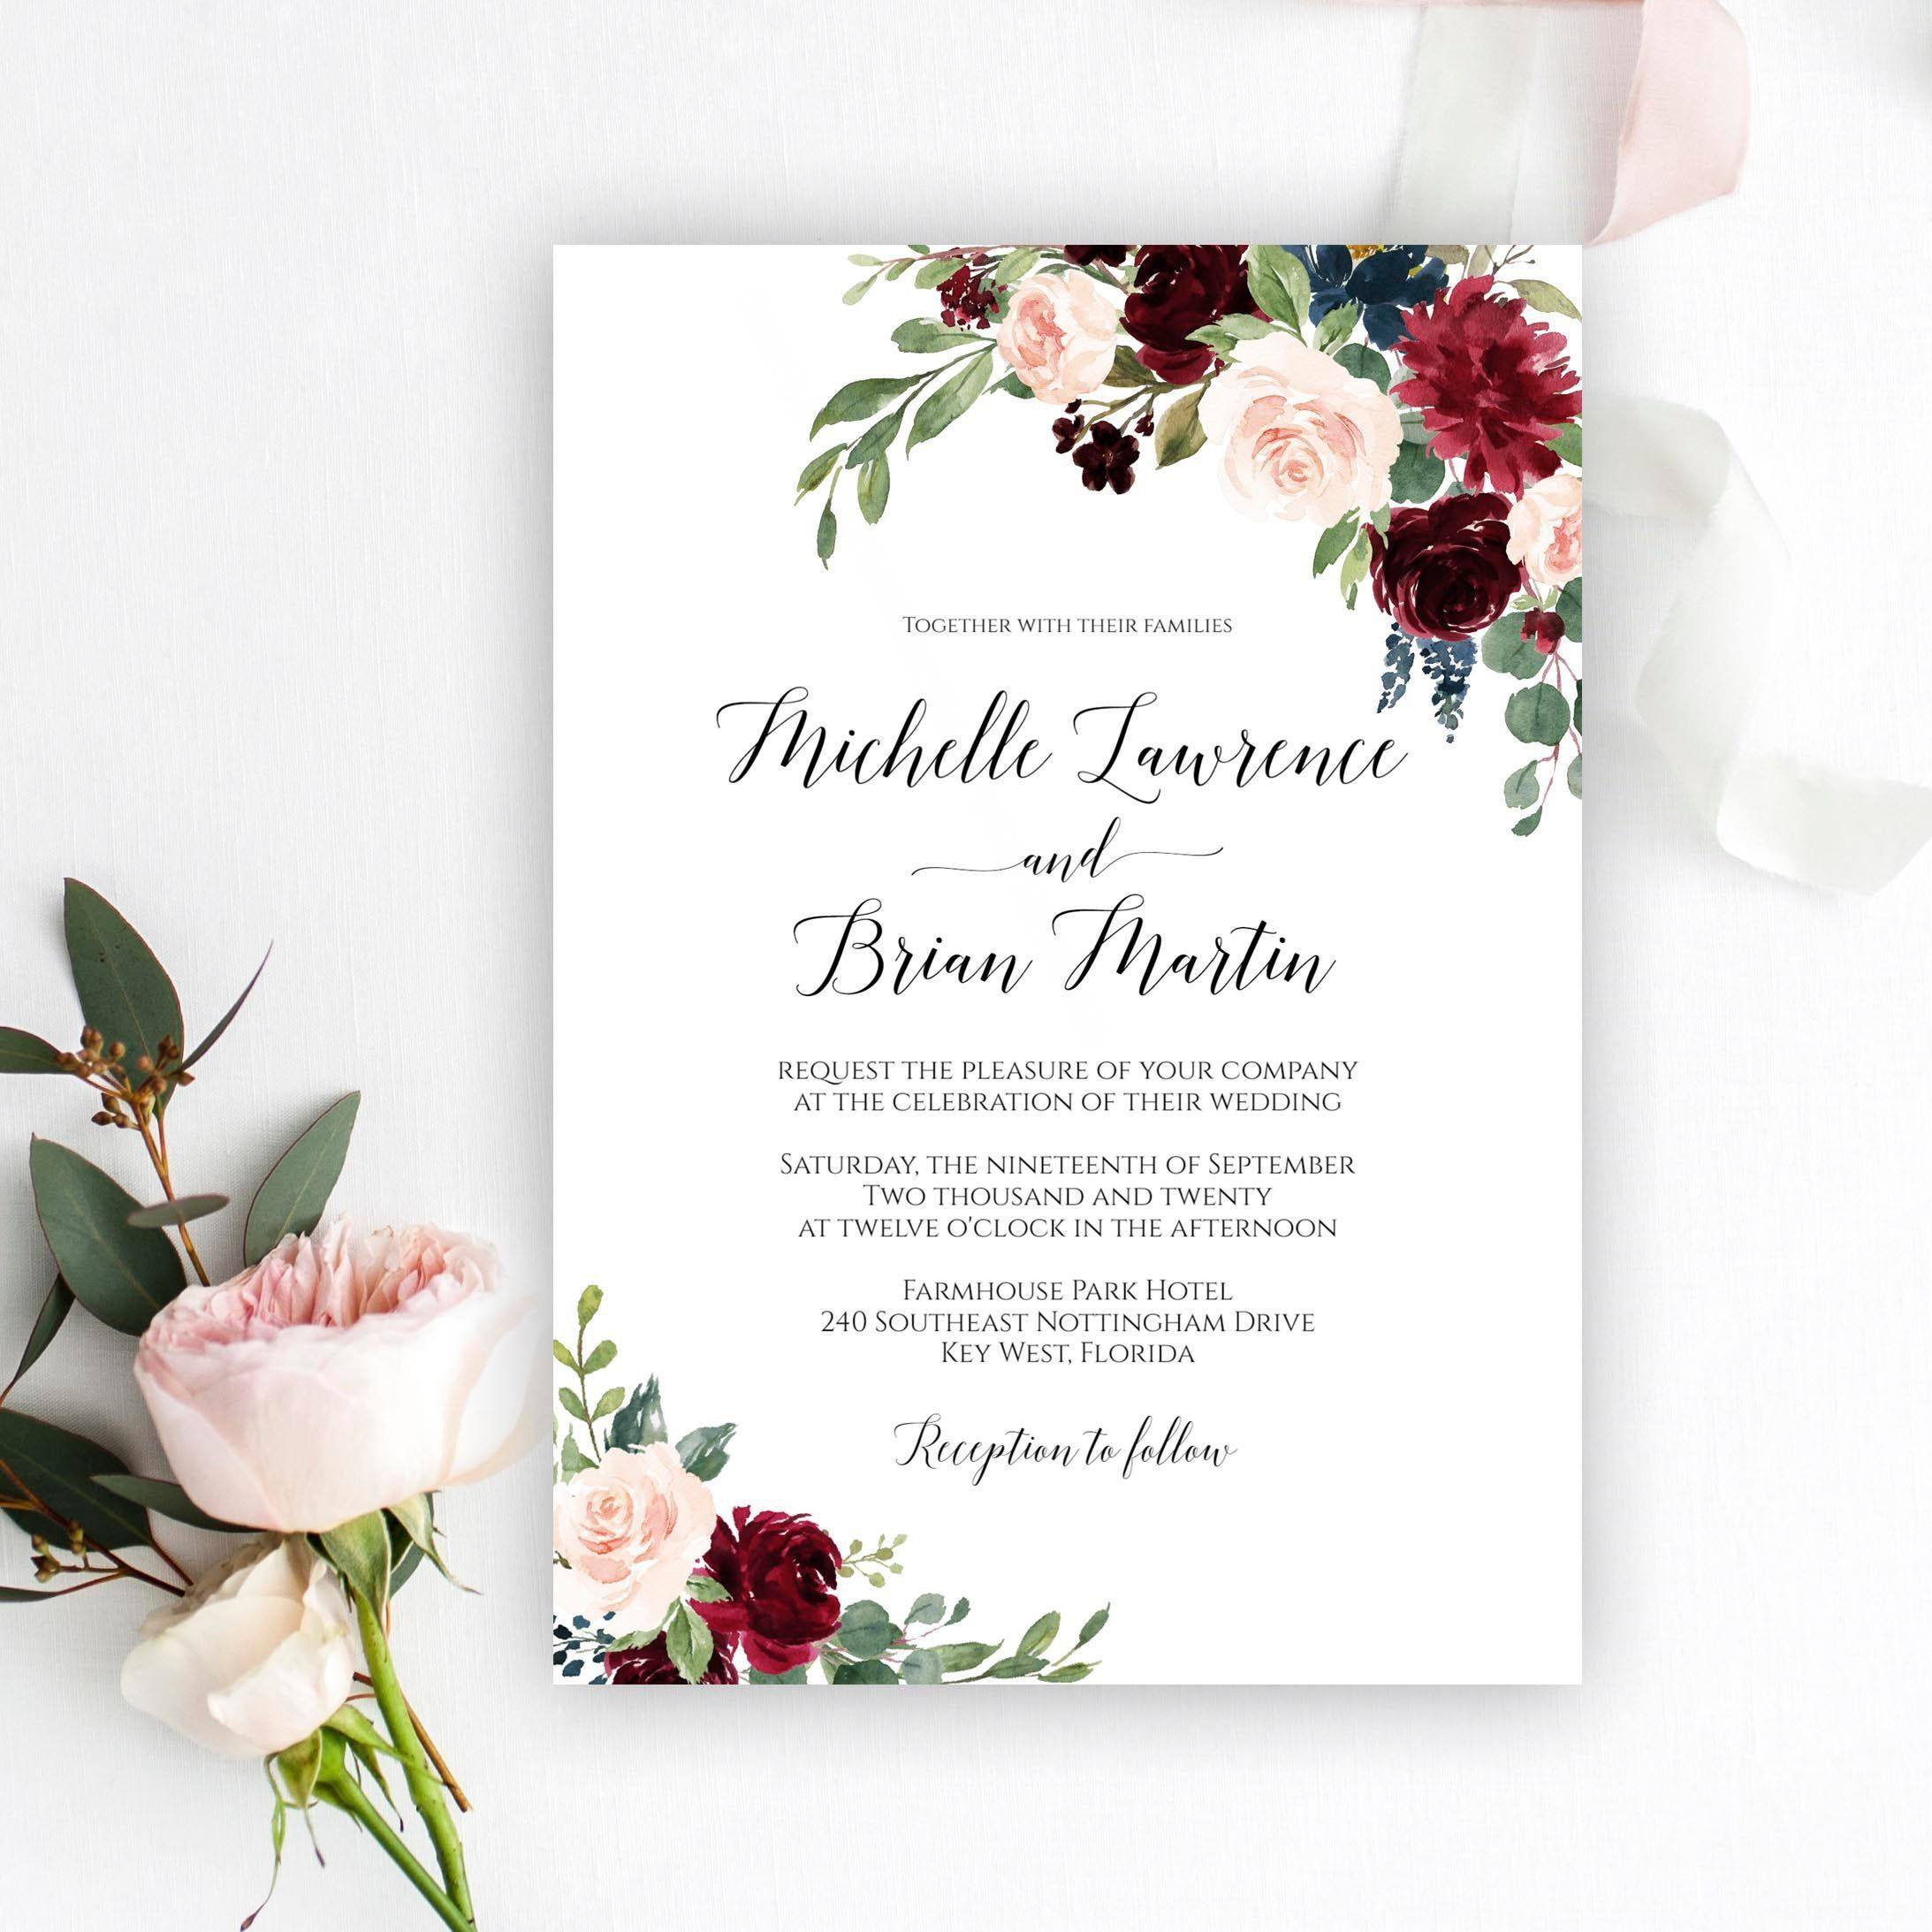 000 Shocking Sample Wedding Invitation Template Free Download High Def  WordingFull